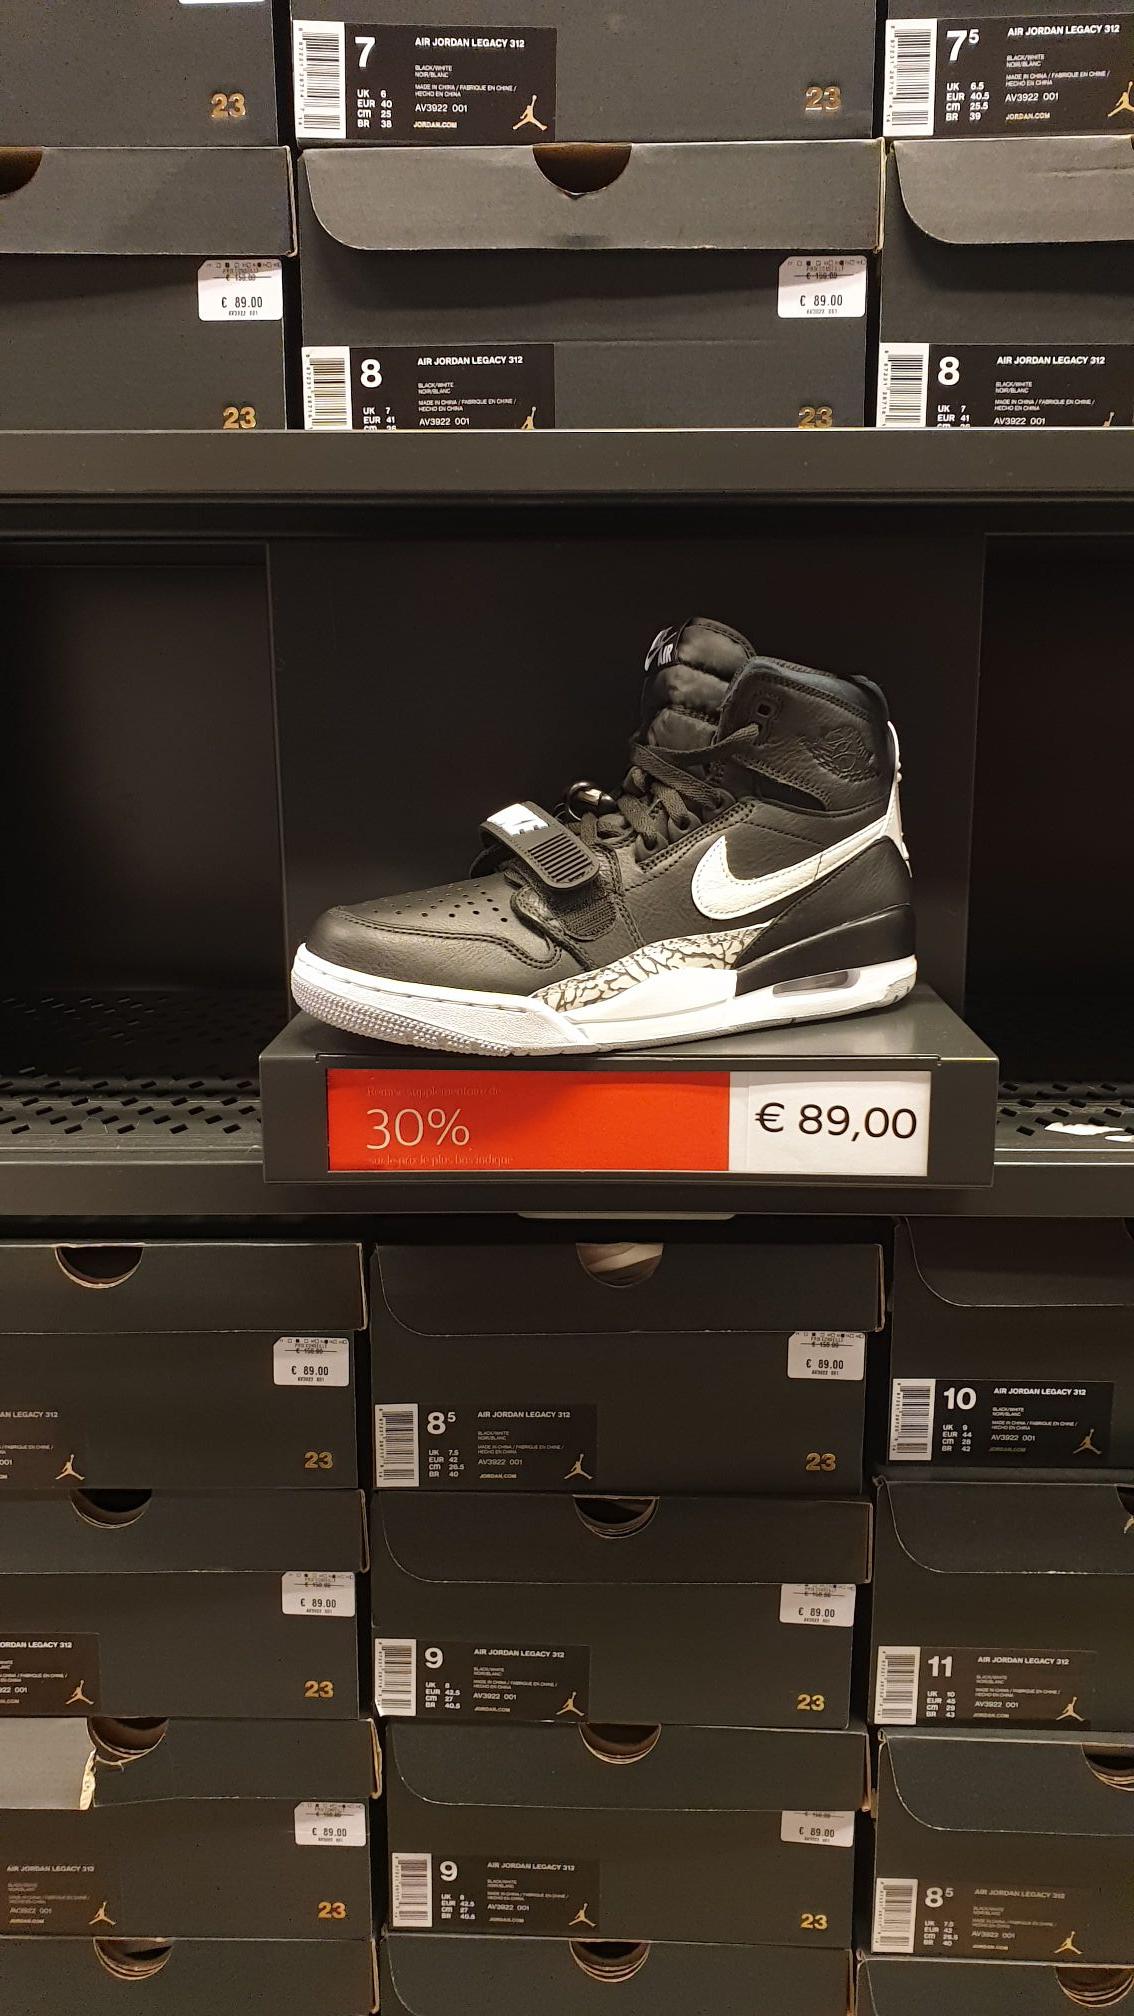 Sneakers Nike Air Jordan Legacy 312 - Taille au choix, Noir / Blanc - Gennevilliers (92)